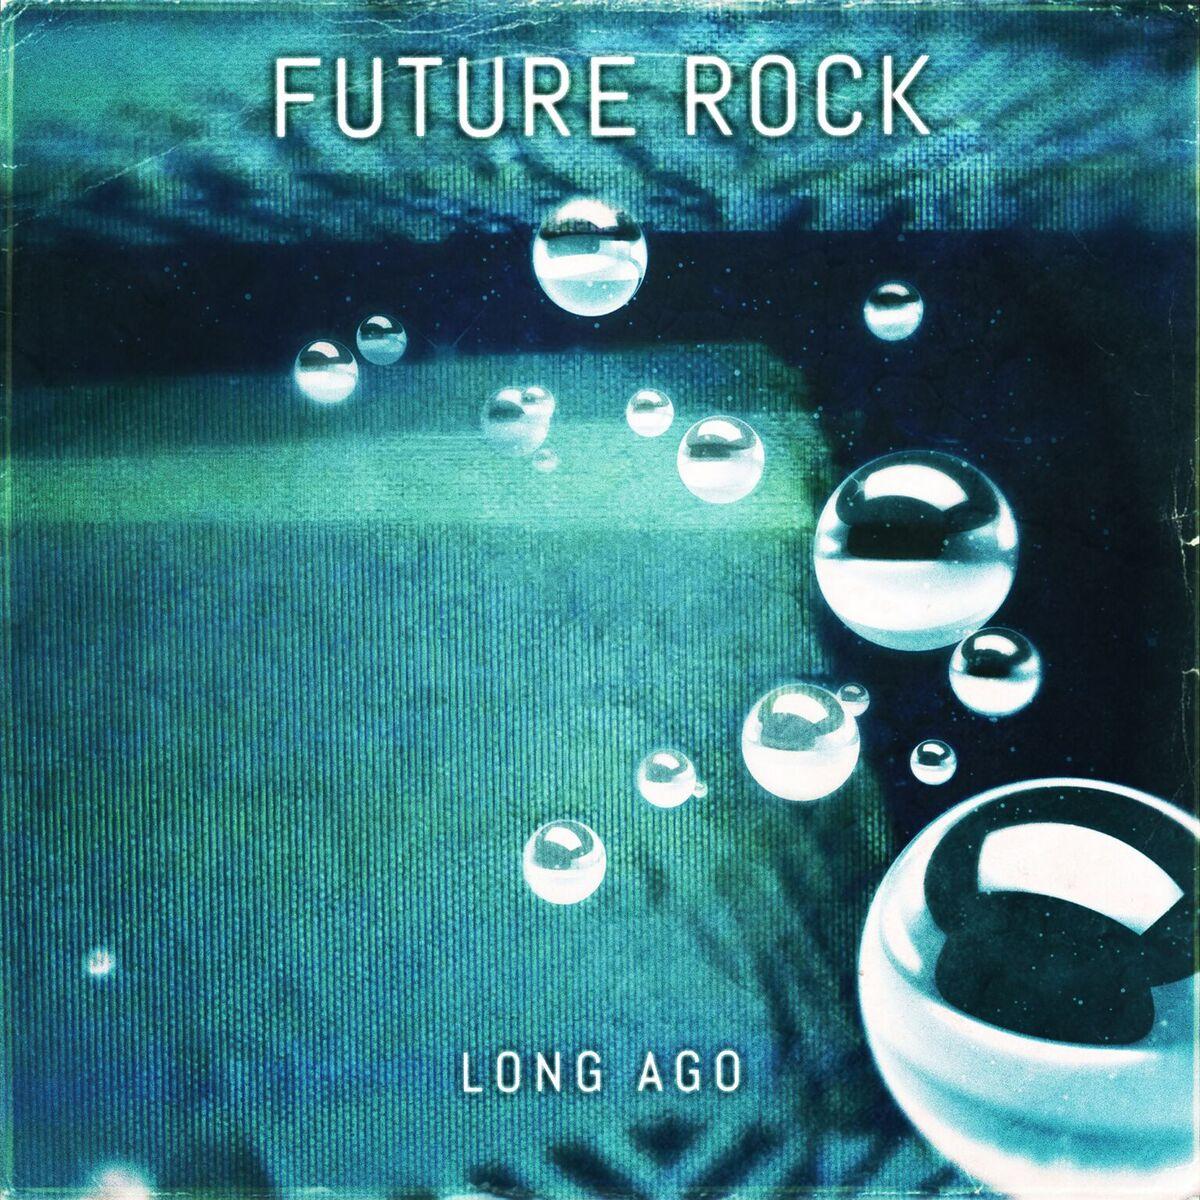 Future Rock Long Ago album artwork. Photo provided by Future Rock.